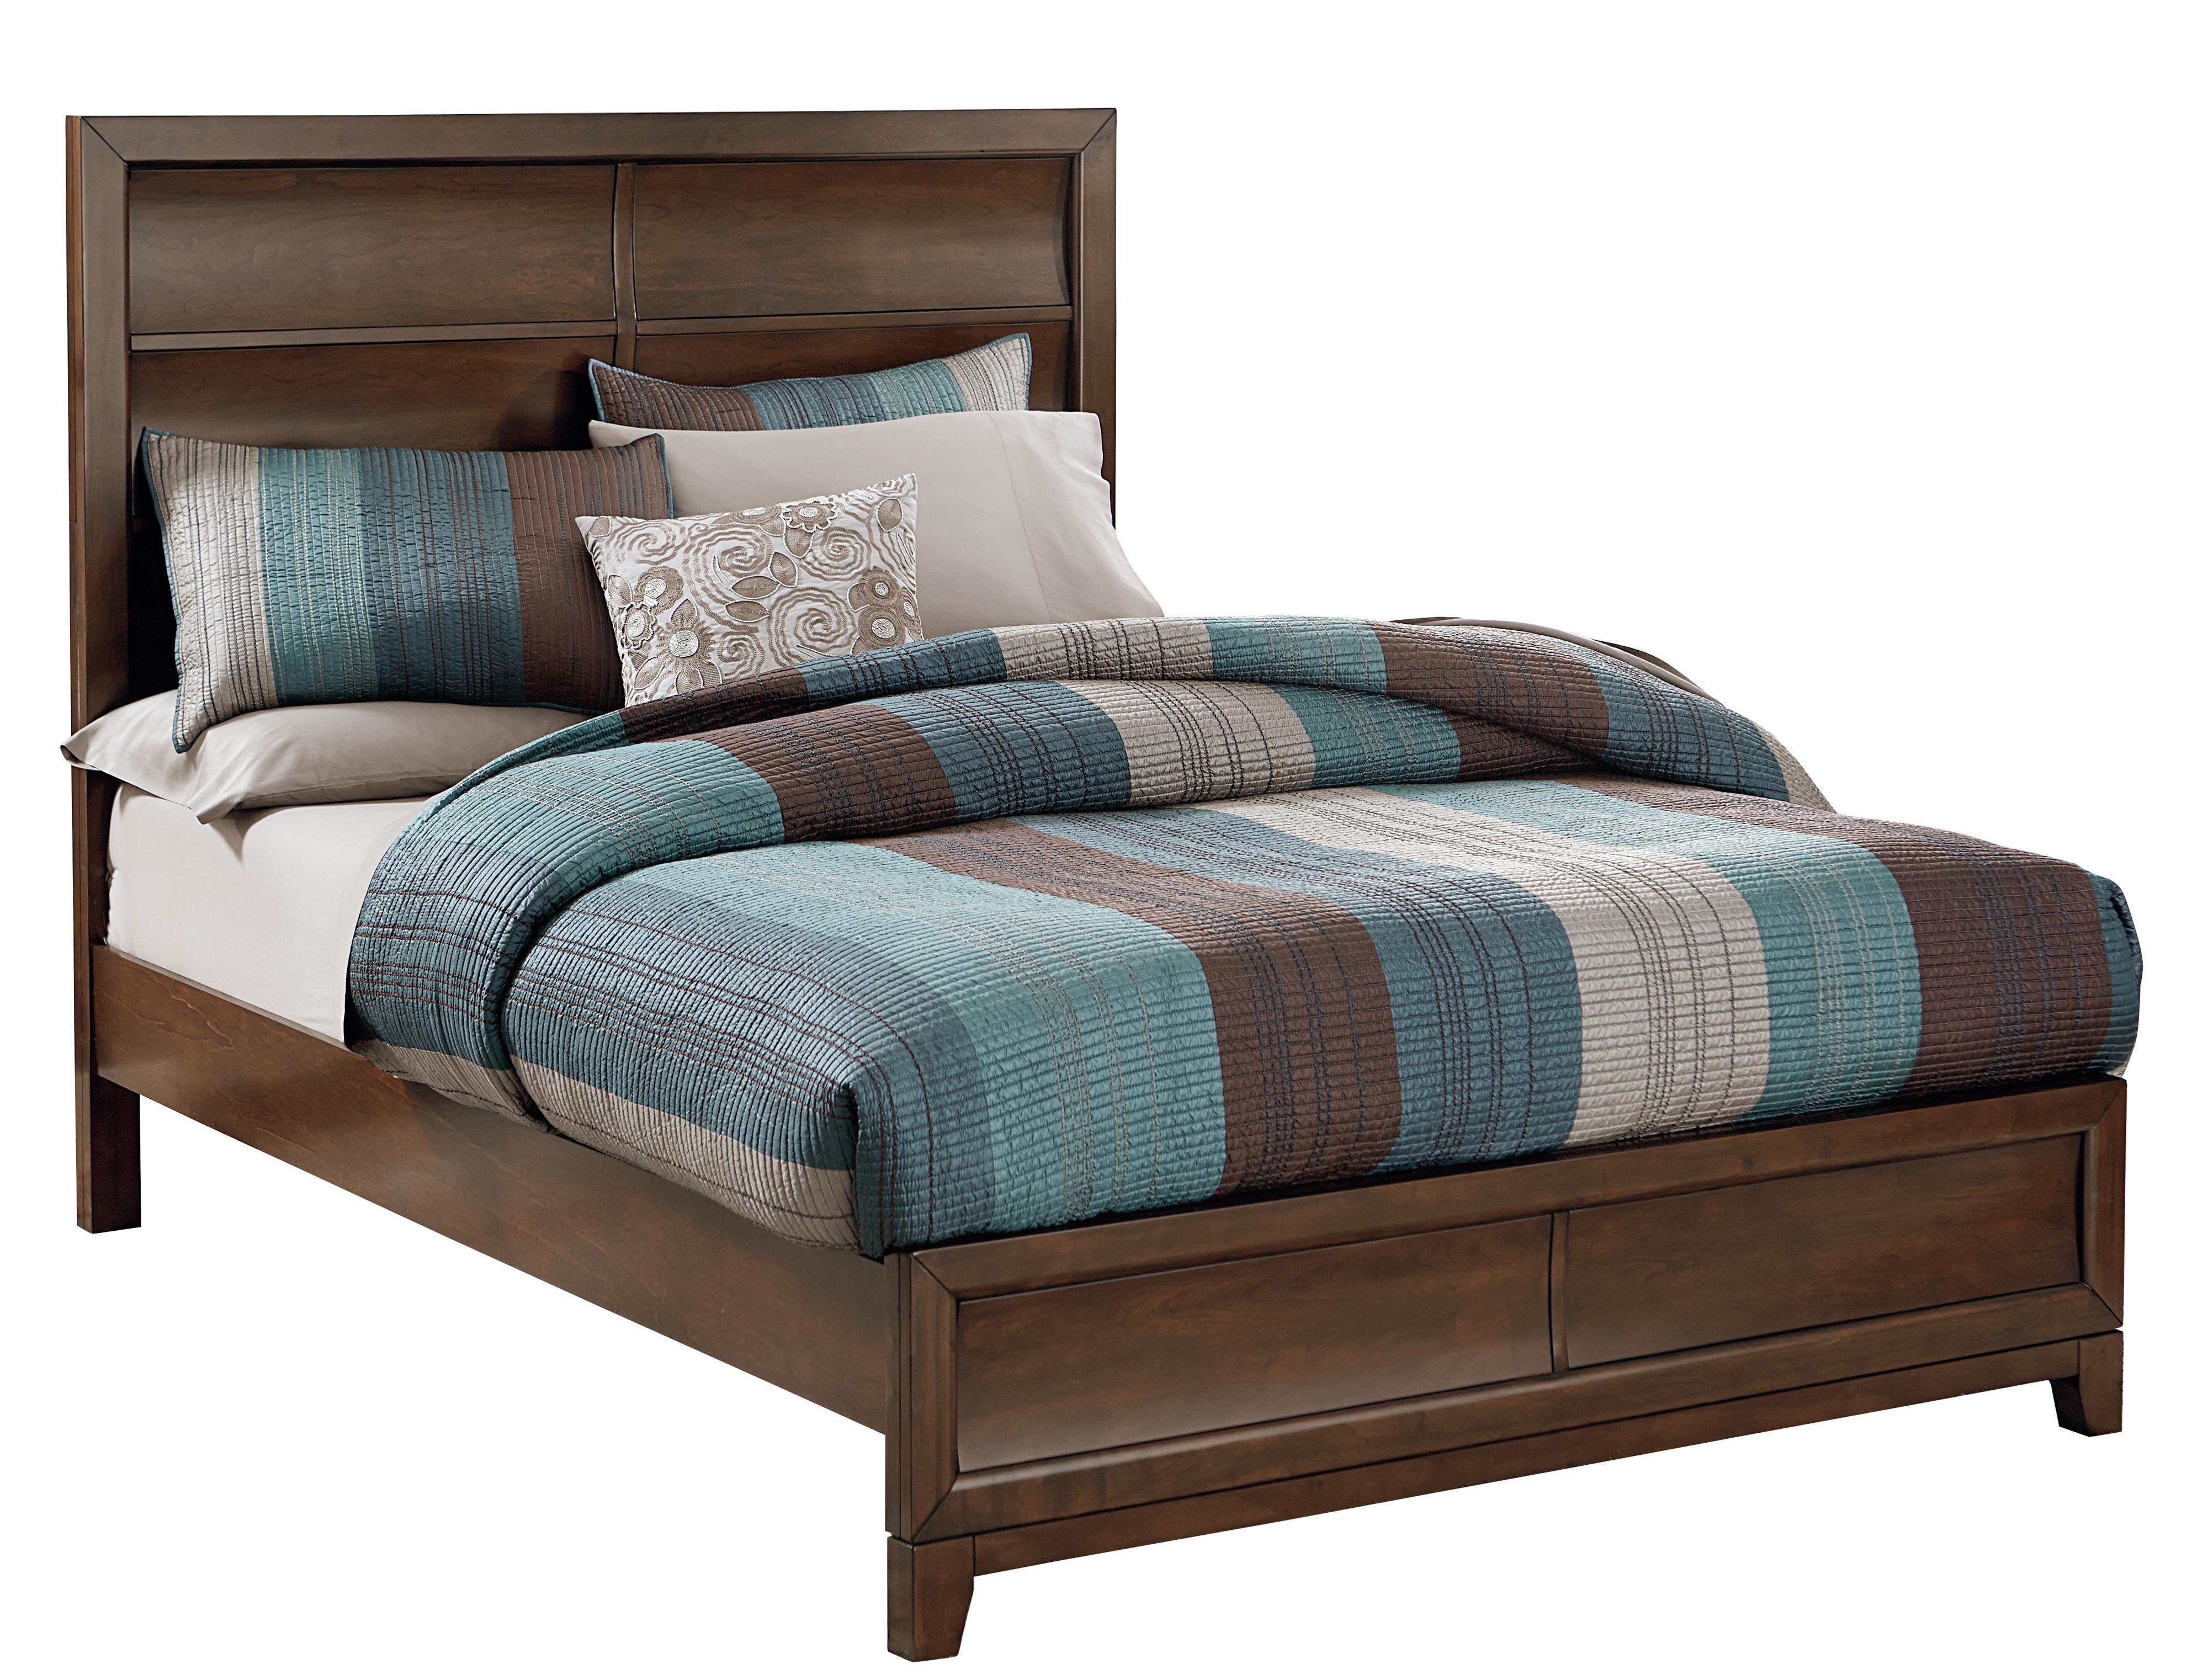 Standard Furniture Amanoi Full Bed - Item Number: 86801+02+03